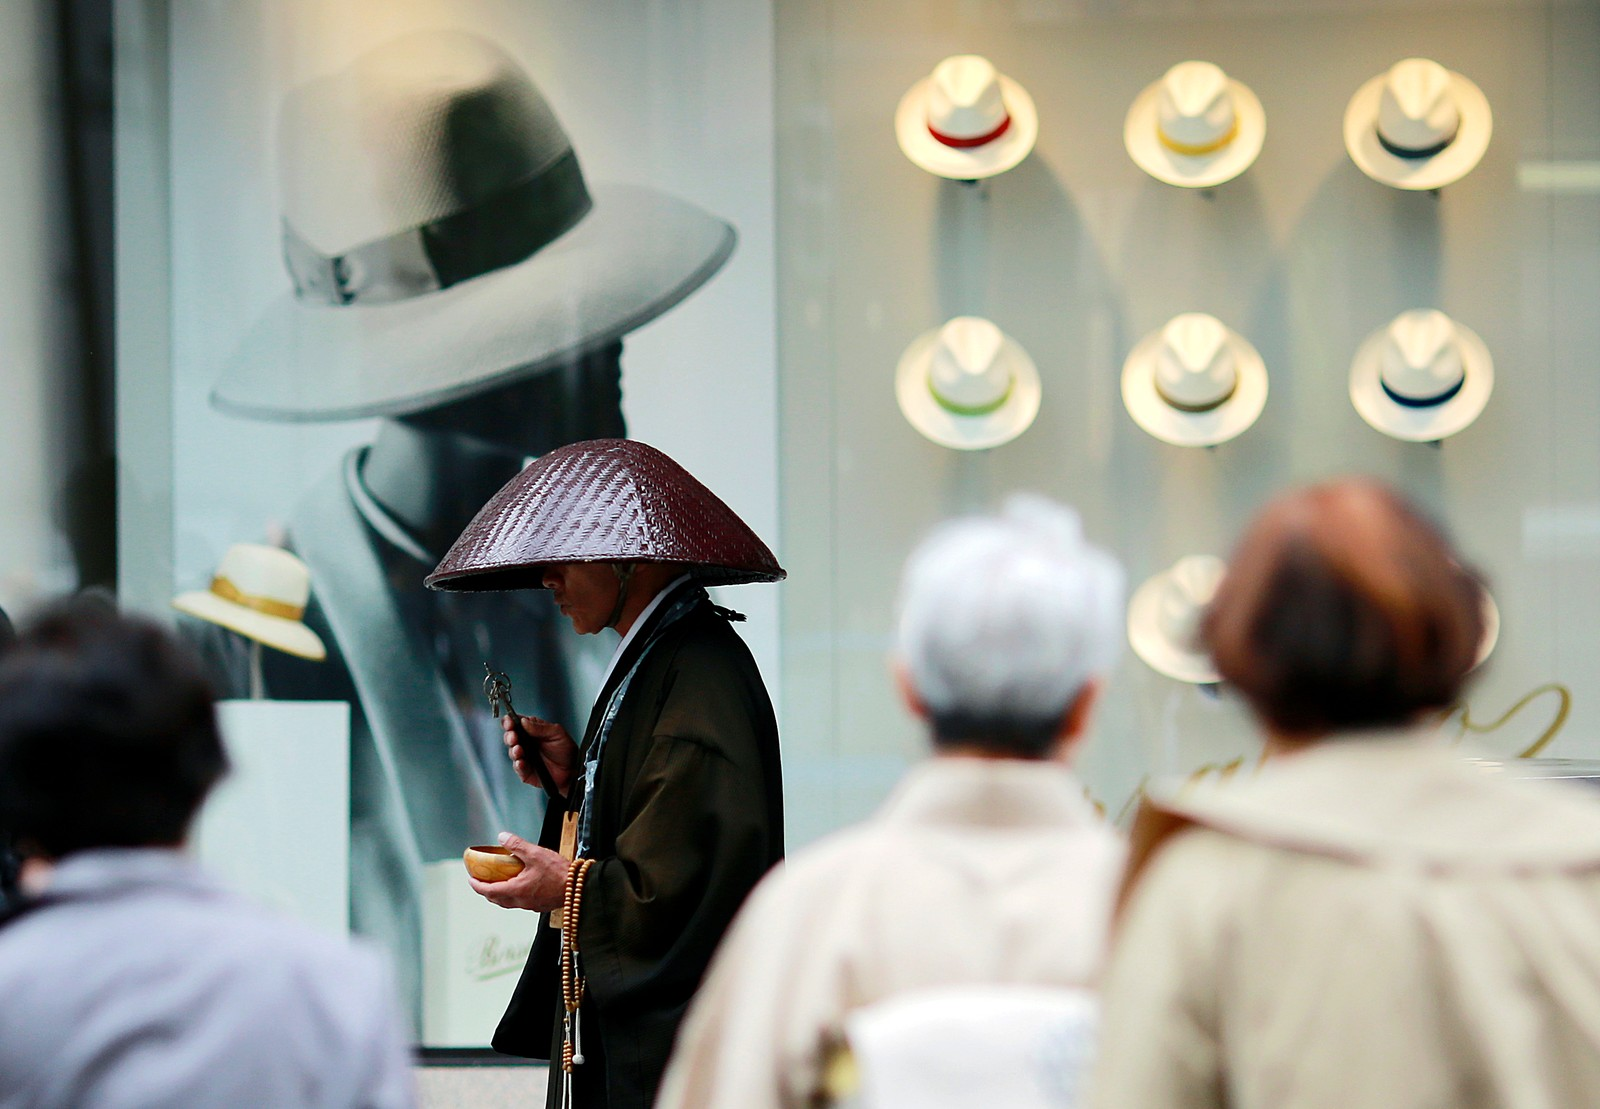 En buddhistmunk ber i handledistriktet Ginza i Tokyo.